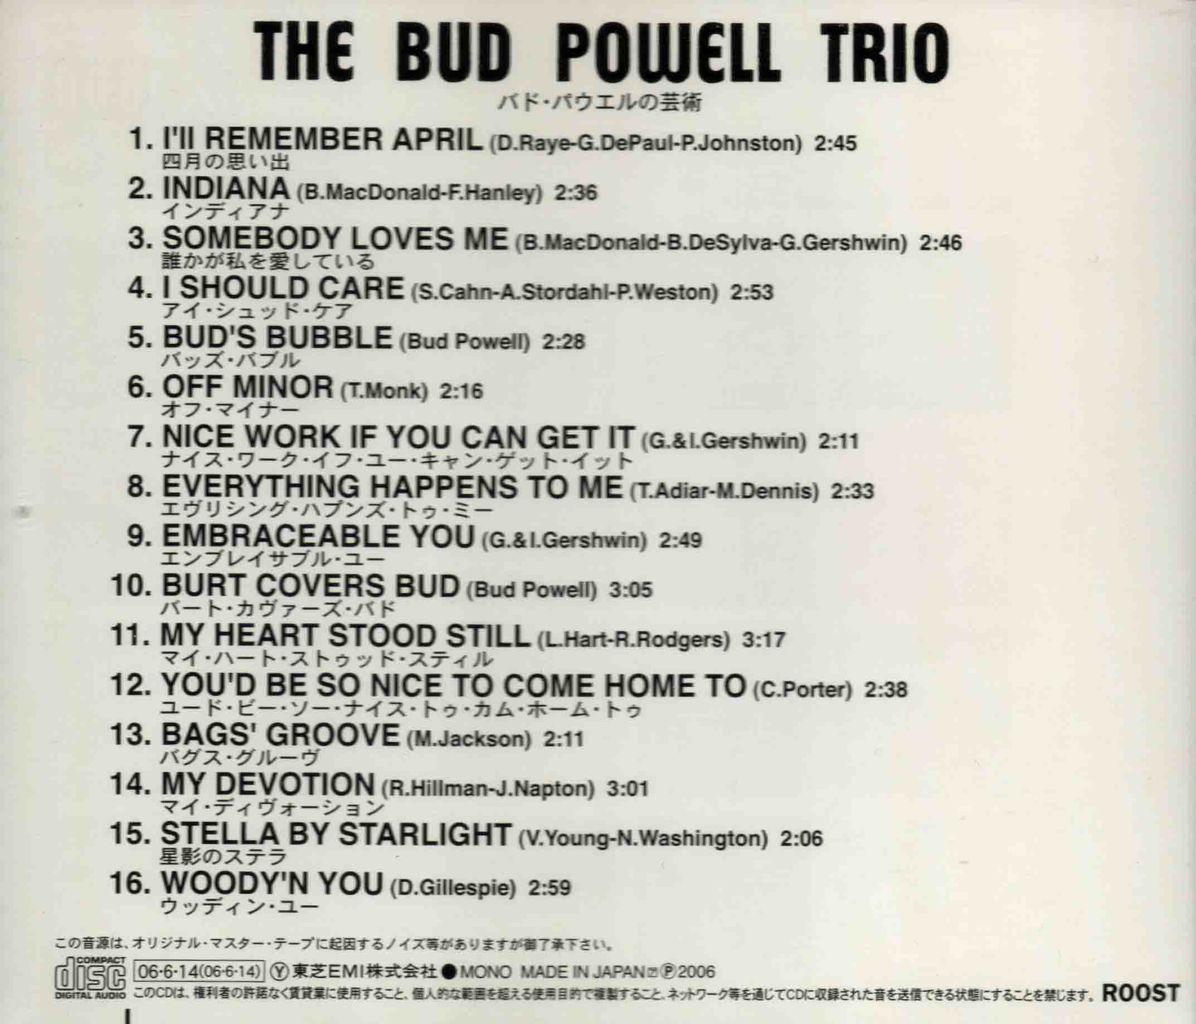 THE BUD POWELL TRIO-2